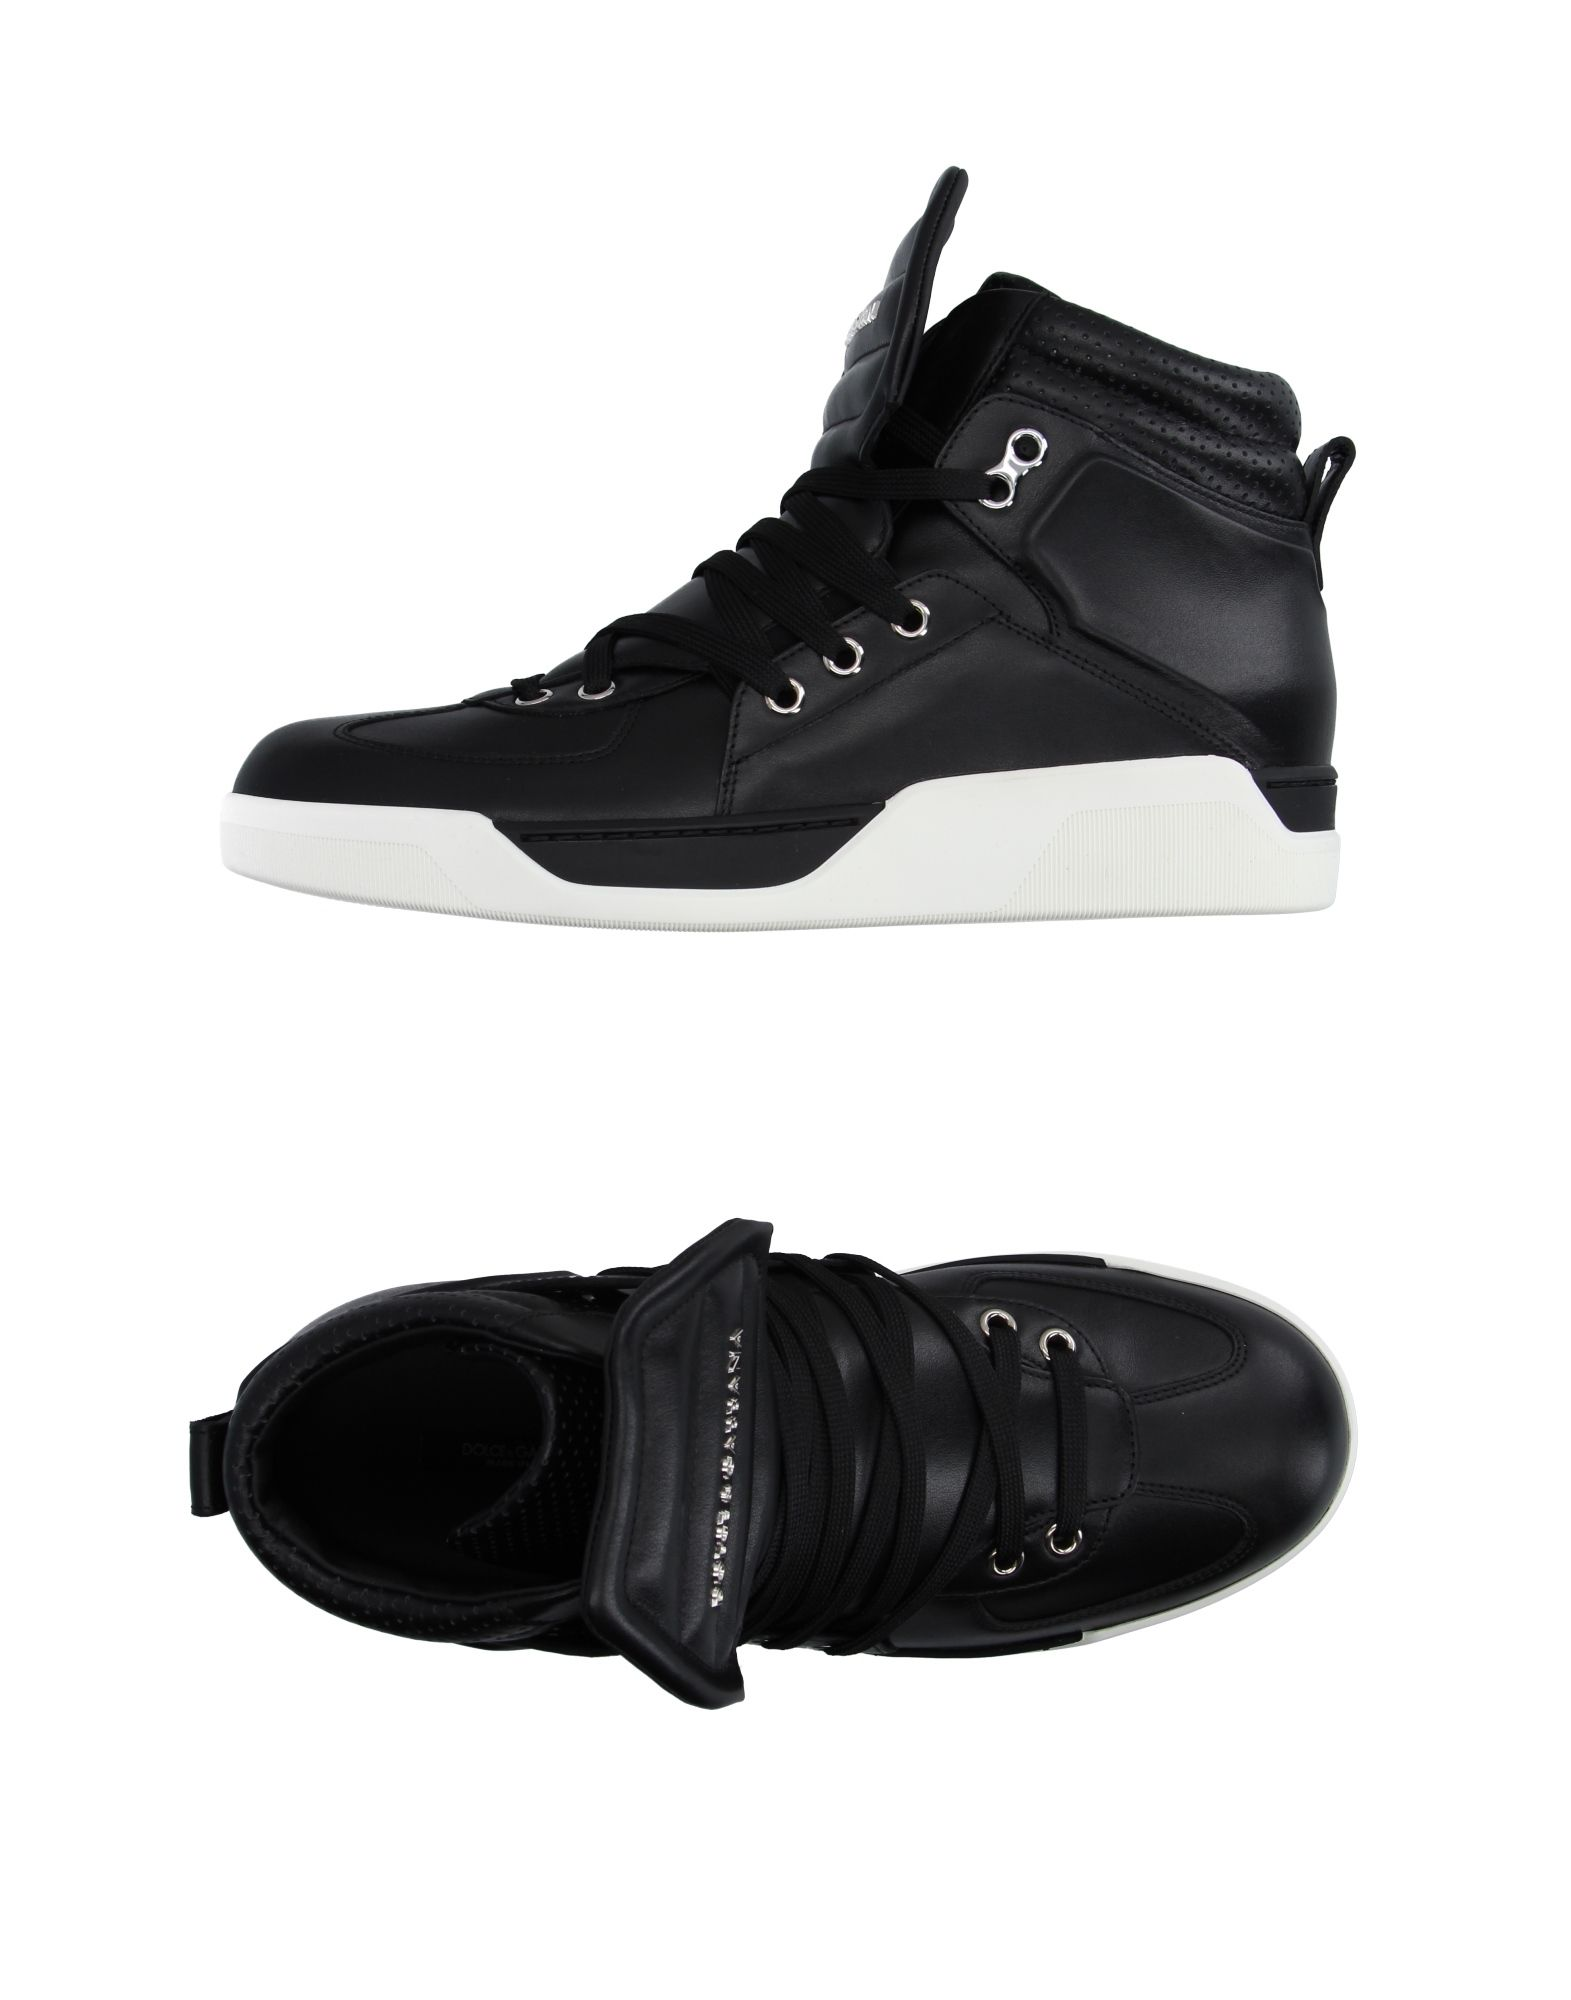 Dolce & Gabbana Sneakers Herren  11099275CG Gute Qualität beliebte Schuhe